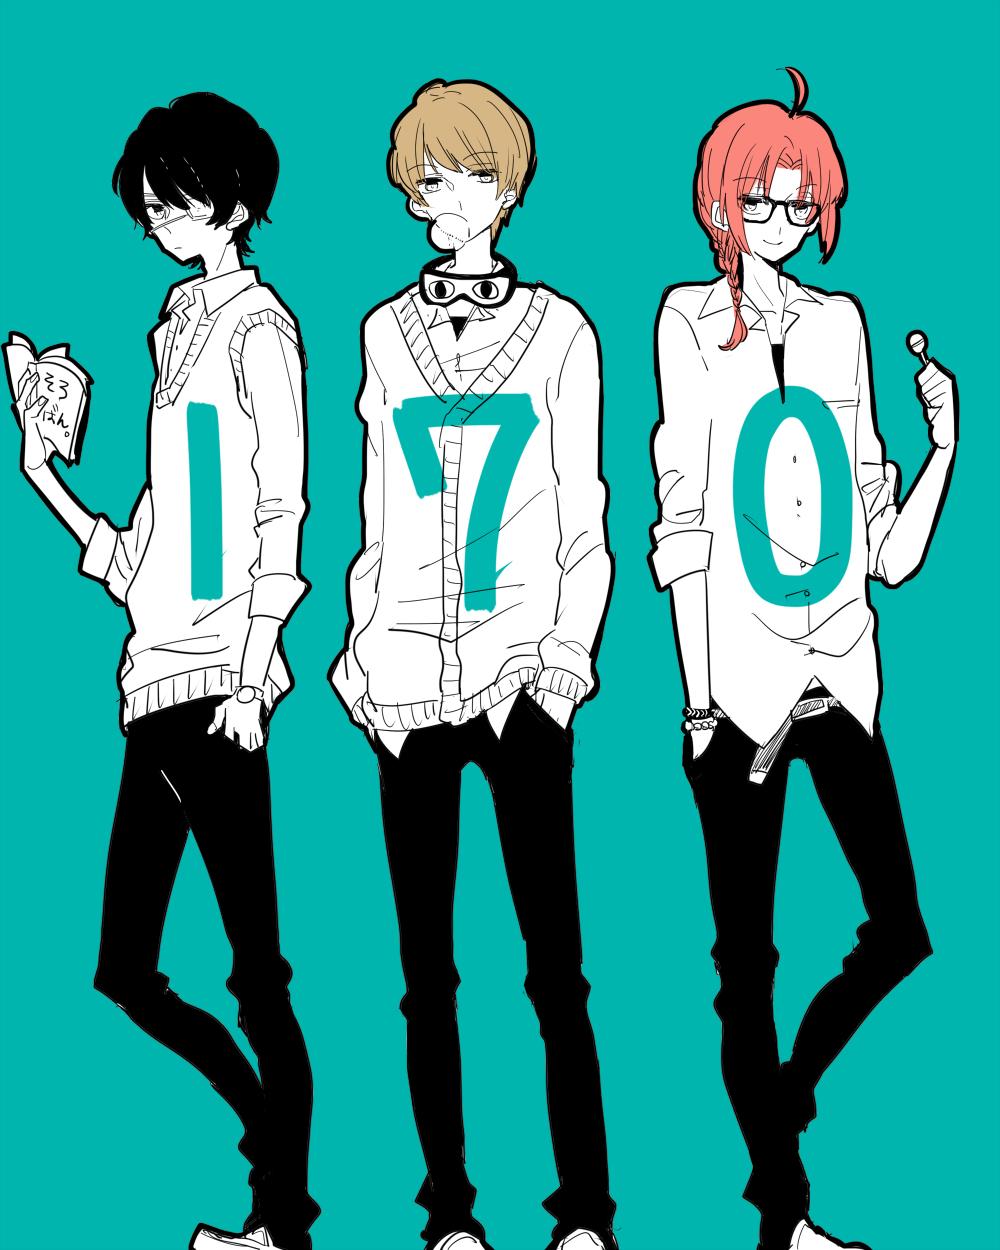 Anime Characters 169 Cm : Cm trio gintama image zerochan anime